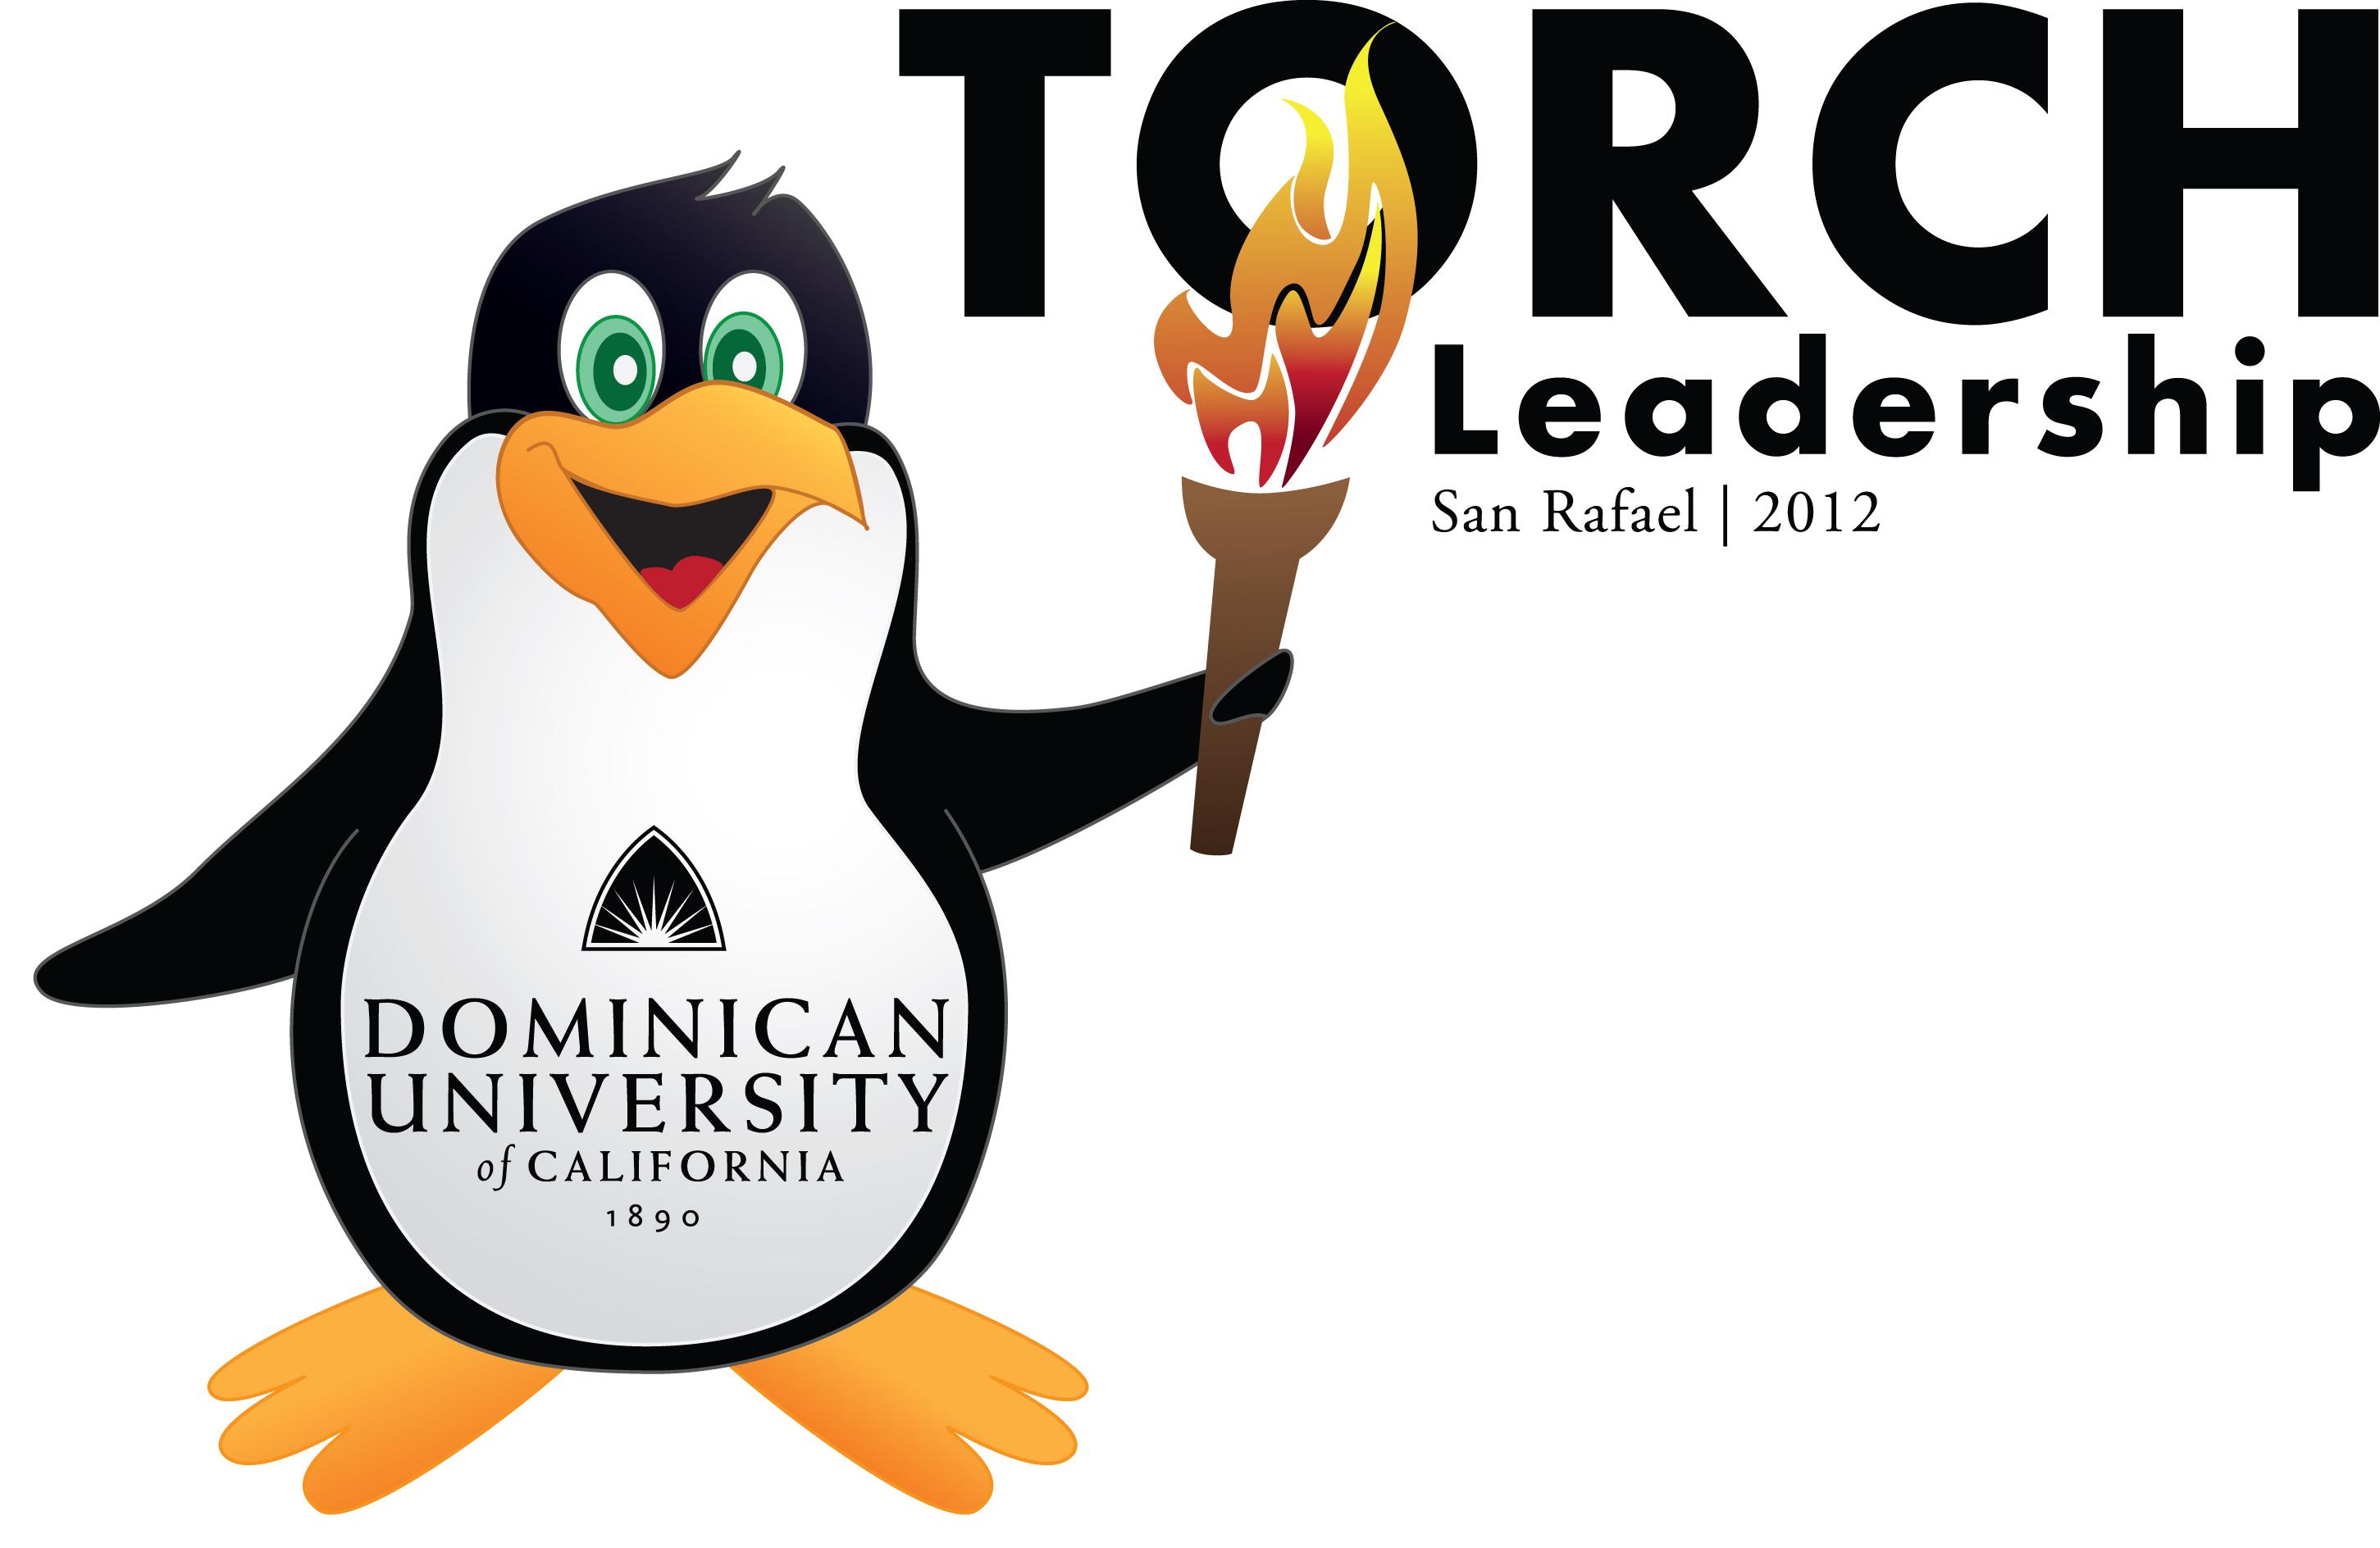 University Leadership Mascot